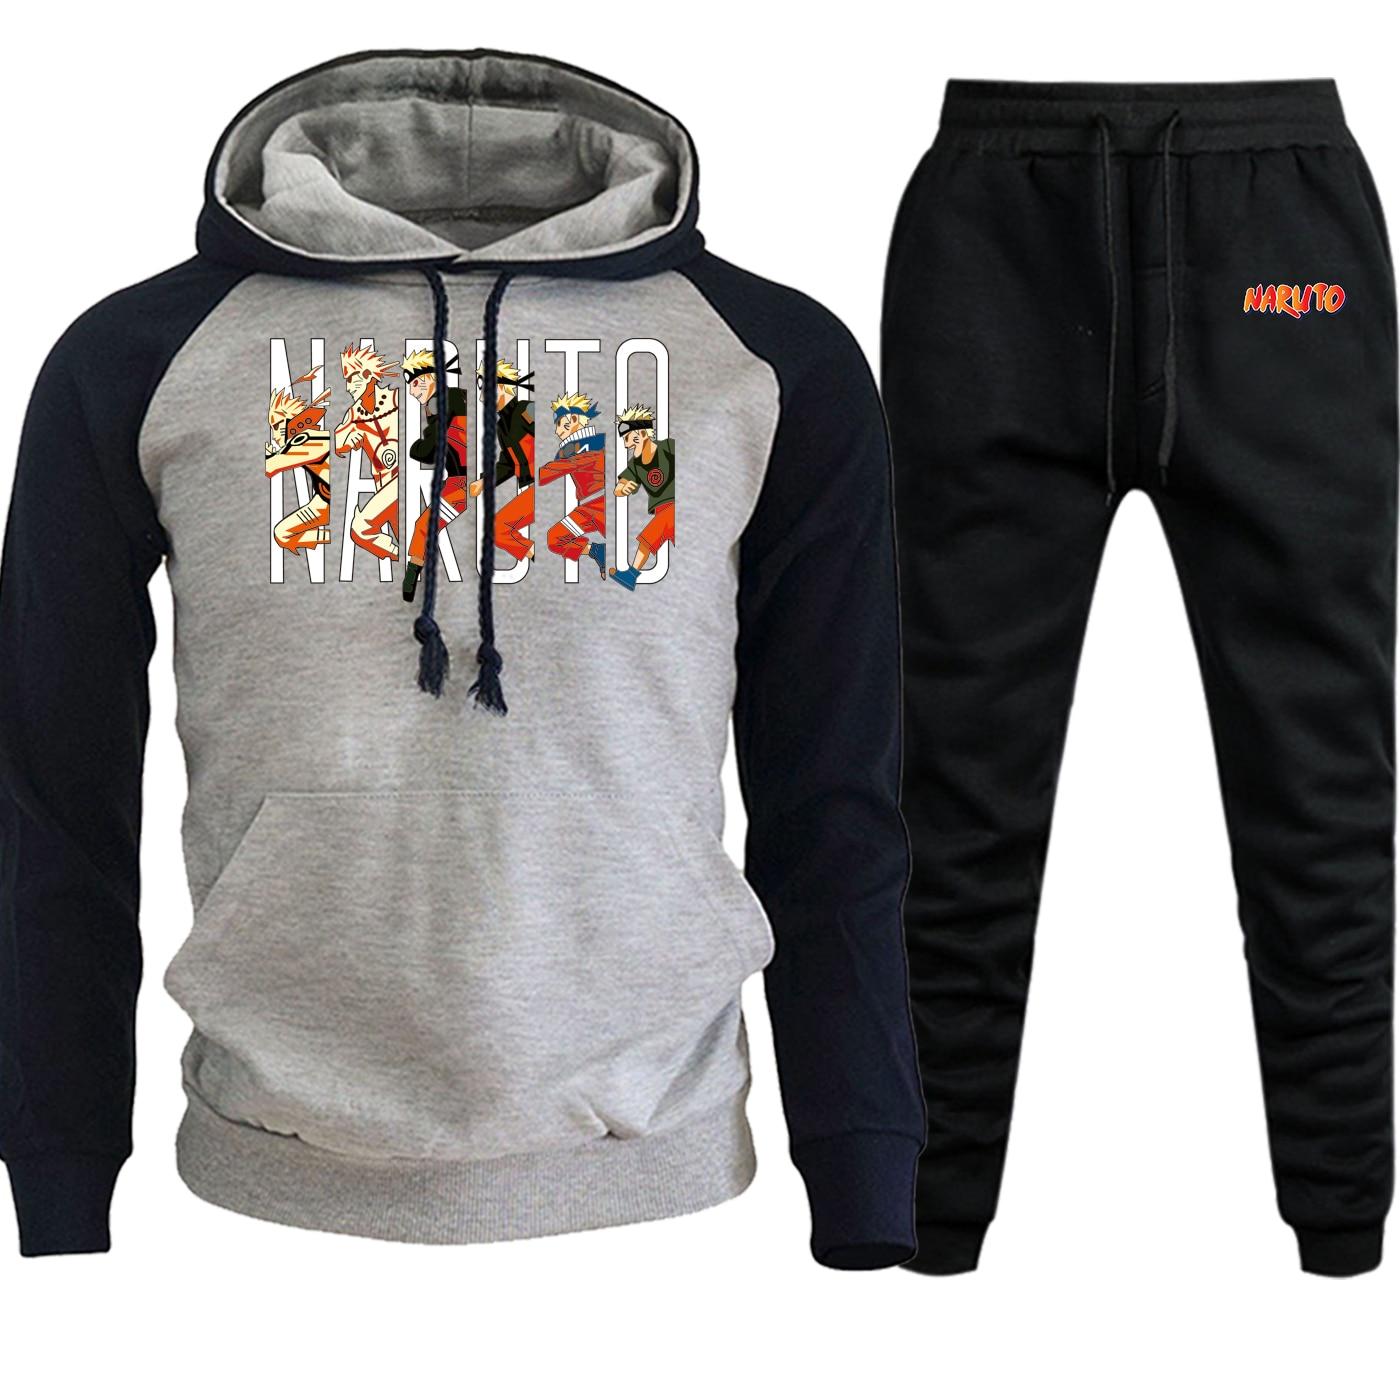 Naruto Japan Anime Hoodies Mens Raglan Sportswear Autumn Winter 2019 New Casual Pullover Suit Fleece Hooded+Pants 2 Piece Set